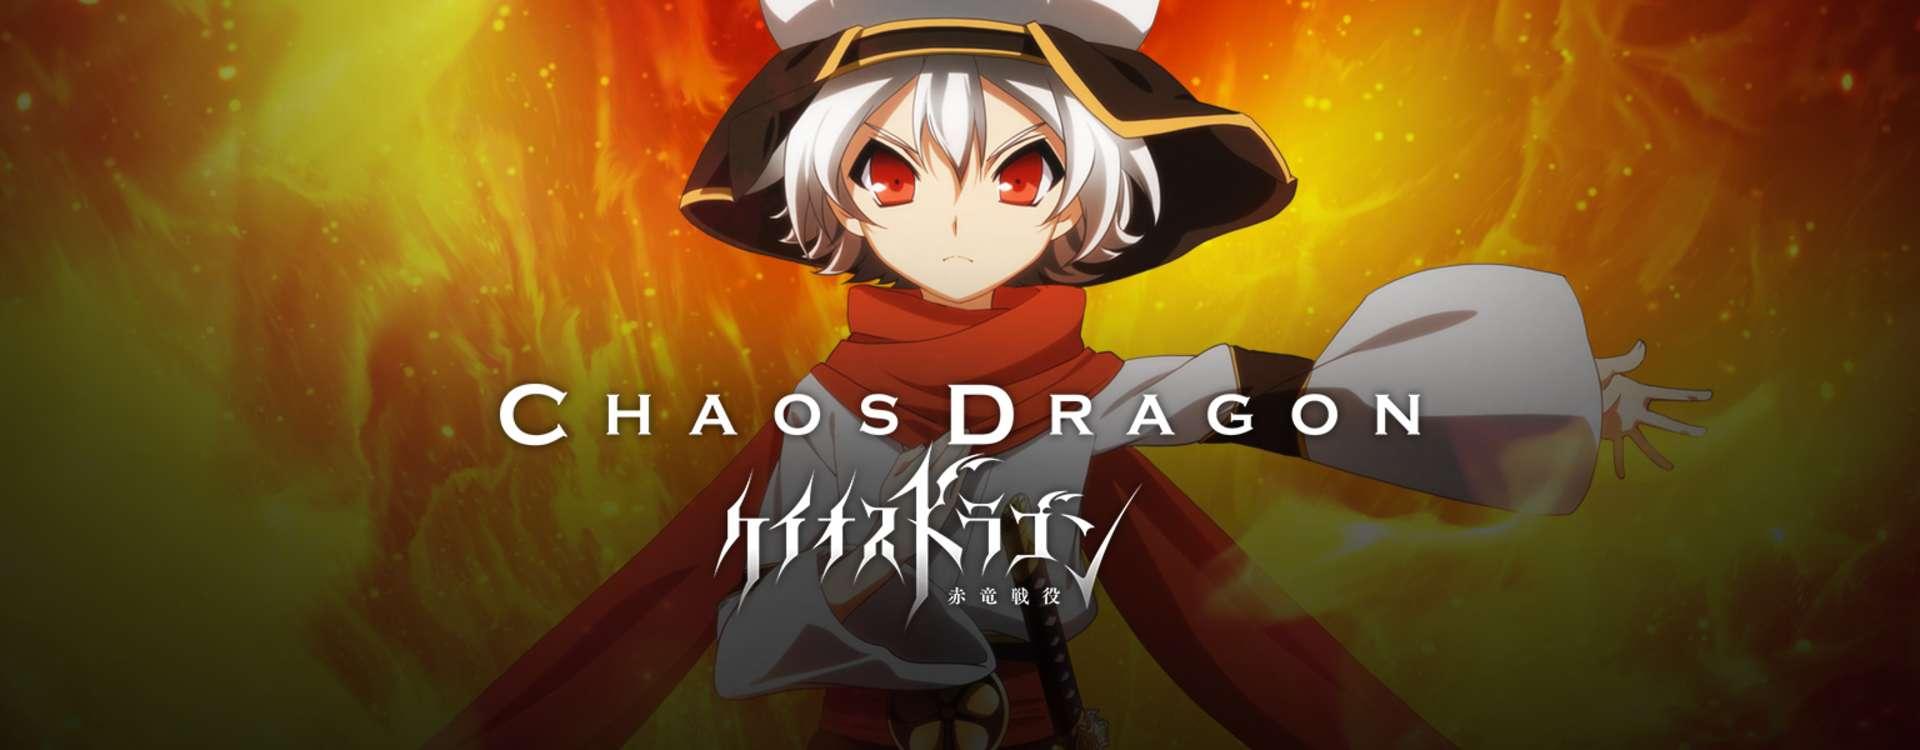 Chaos Dragon Serien Stream